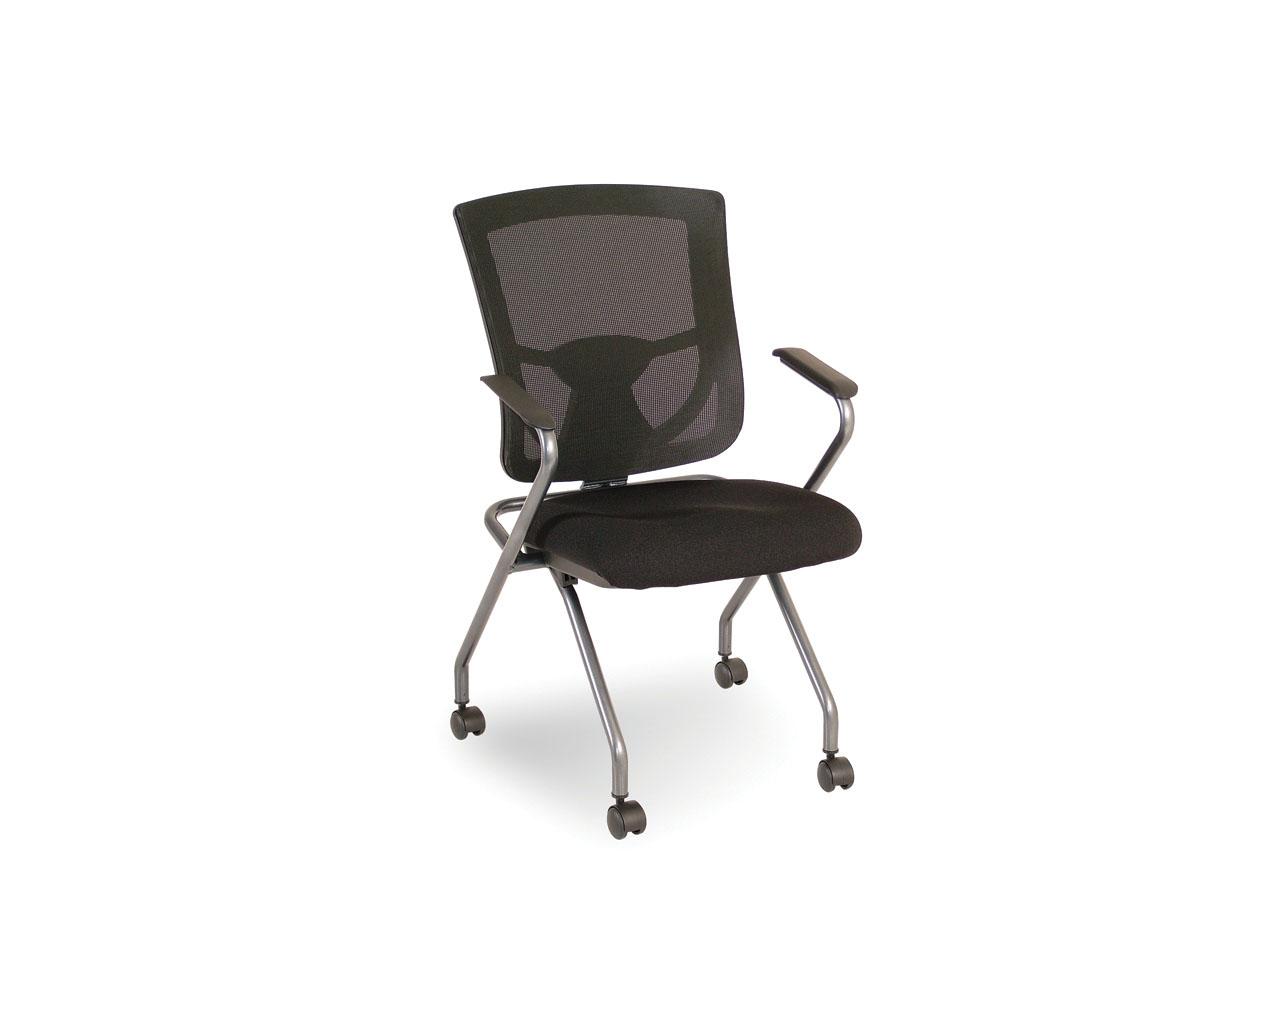 ergonomic chair pros tommy bahama backpack beach coolmesh pro nesting